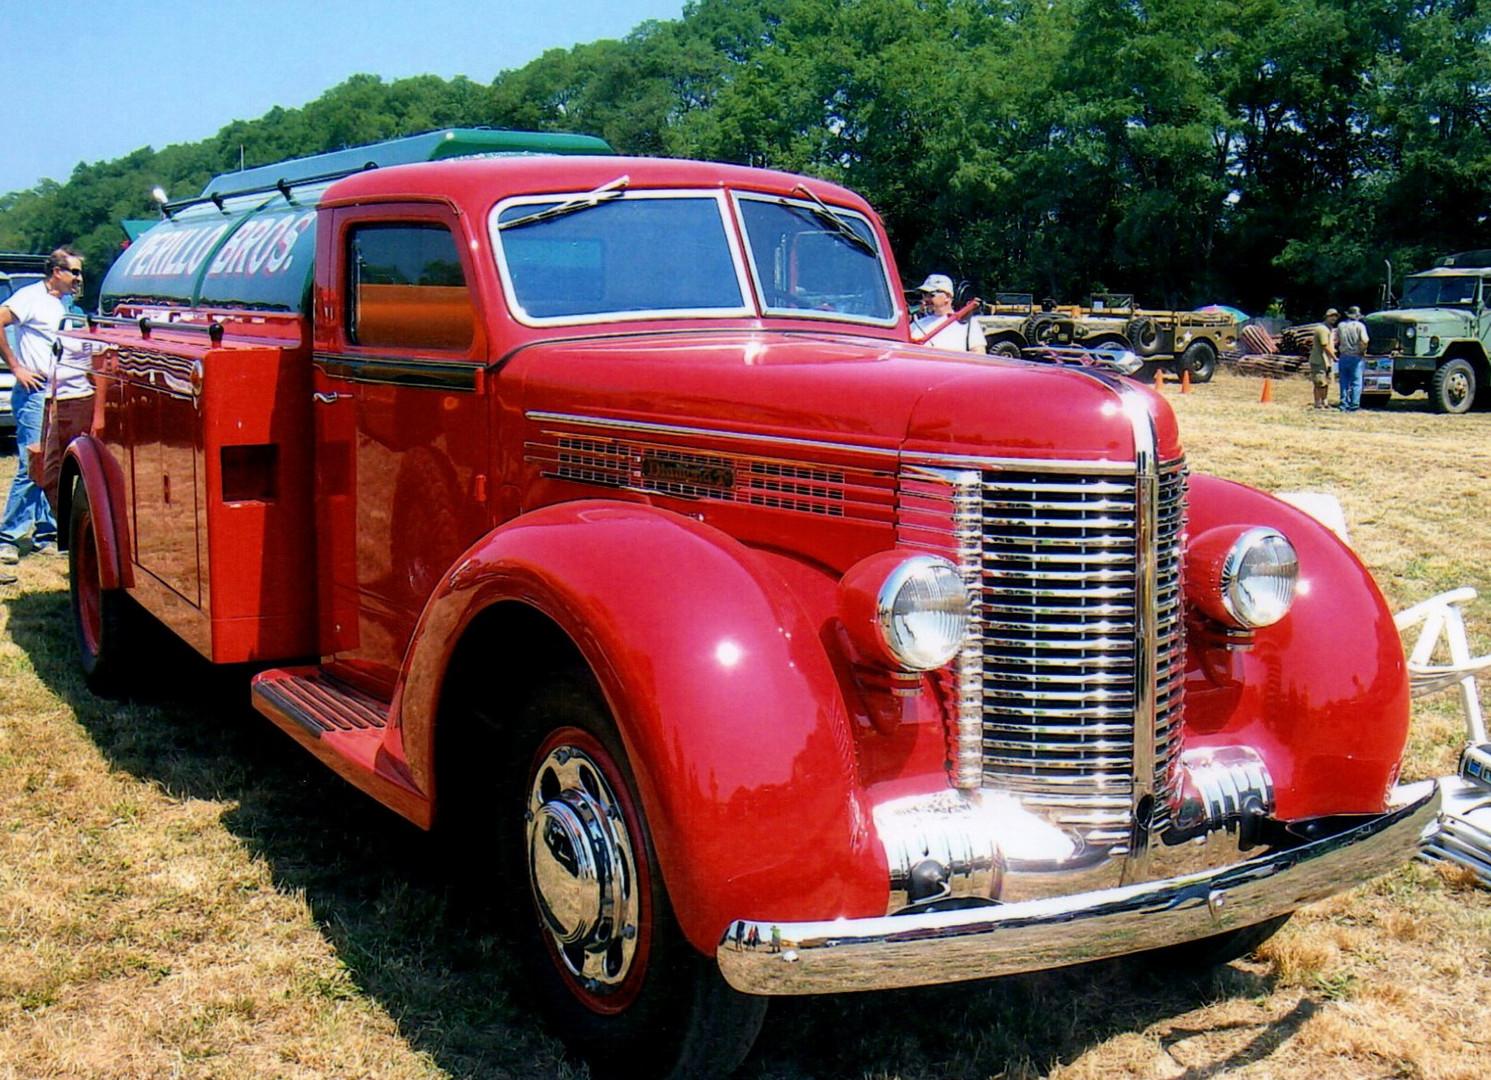 1938 Diamond T model 406 tanker - Paul Perillo